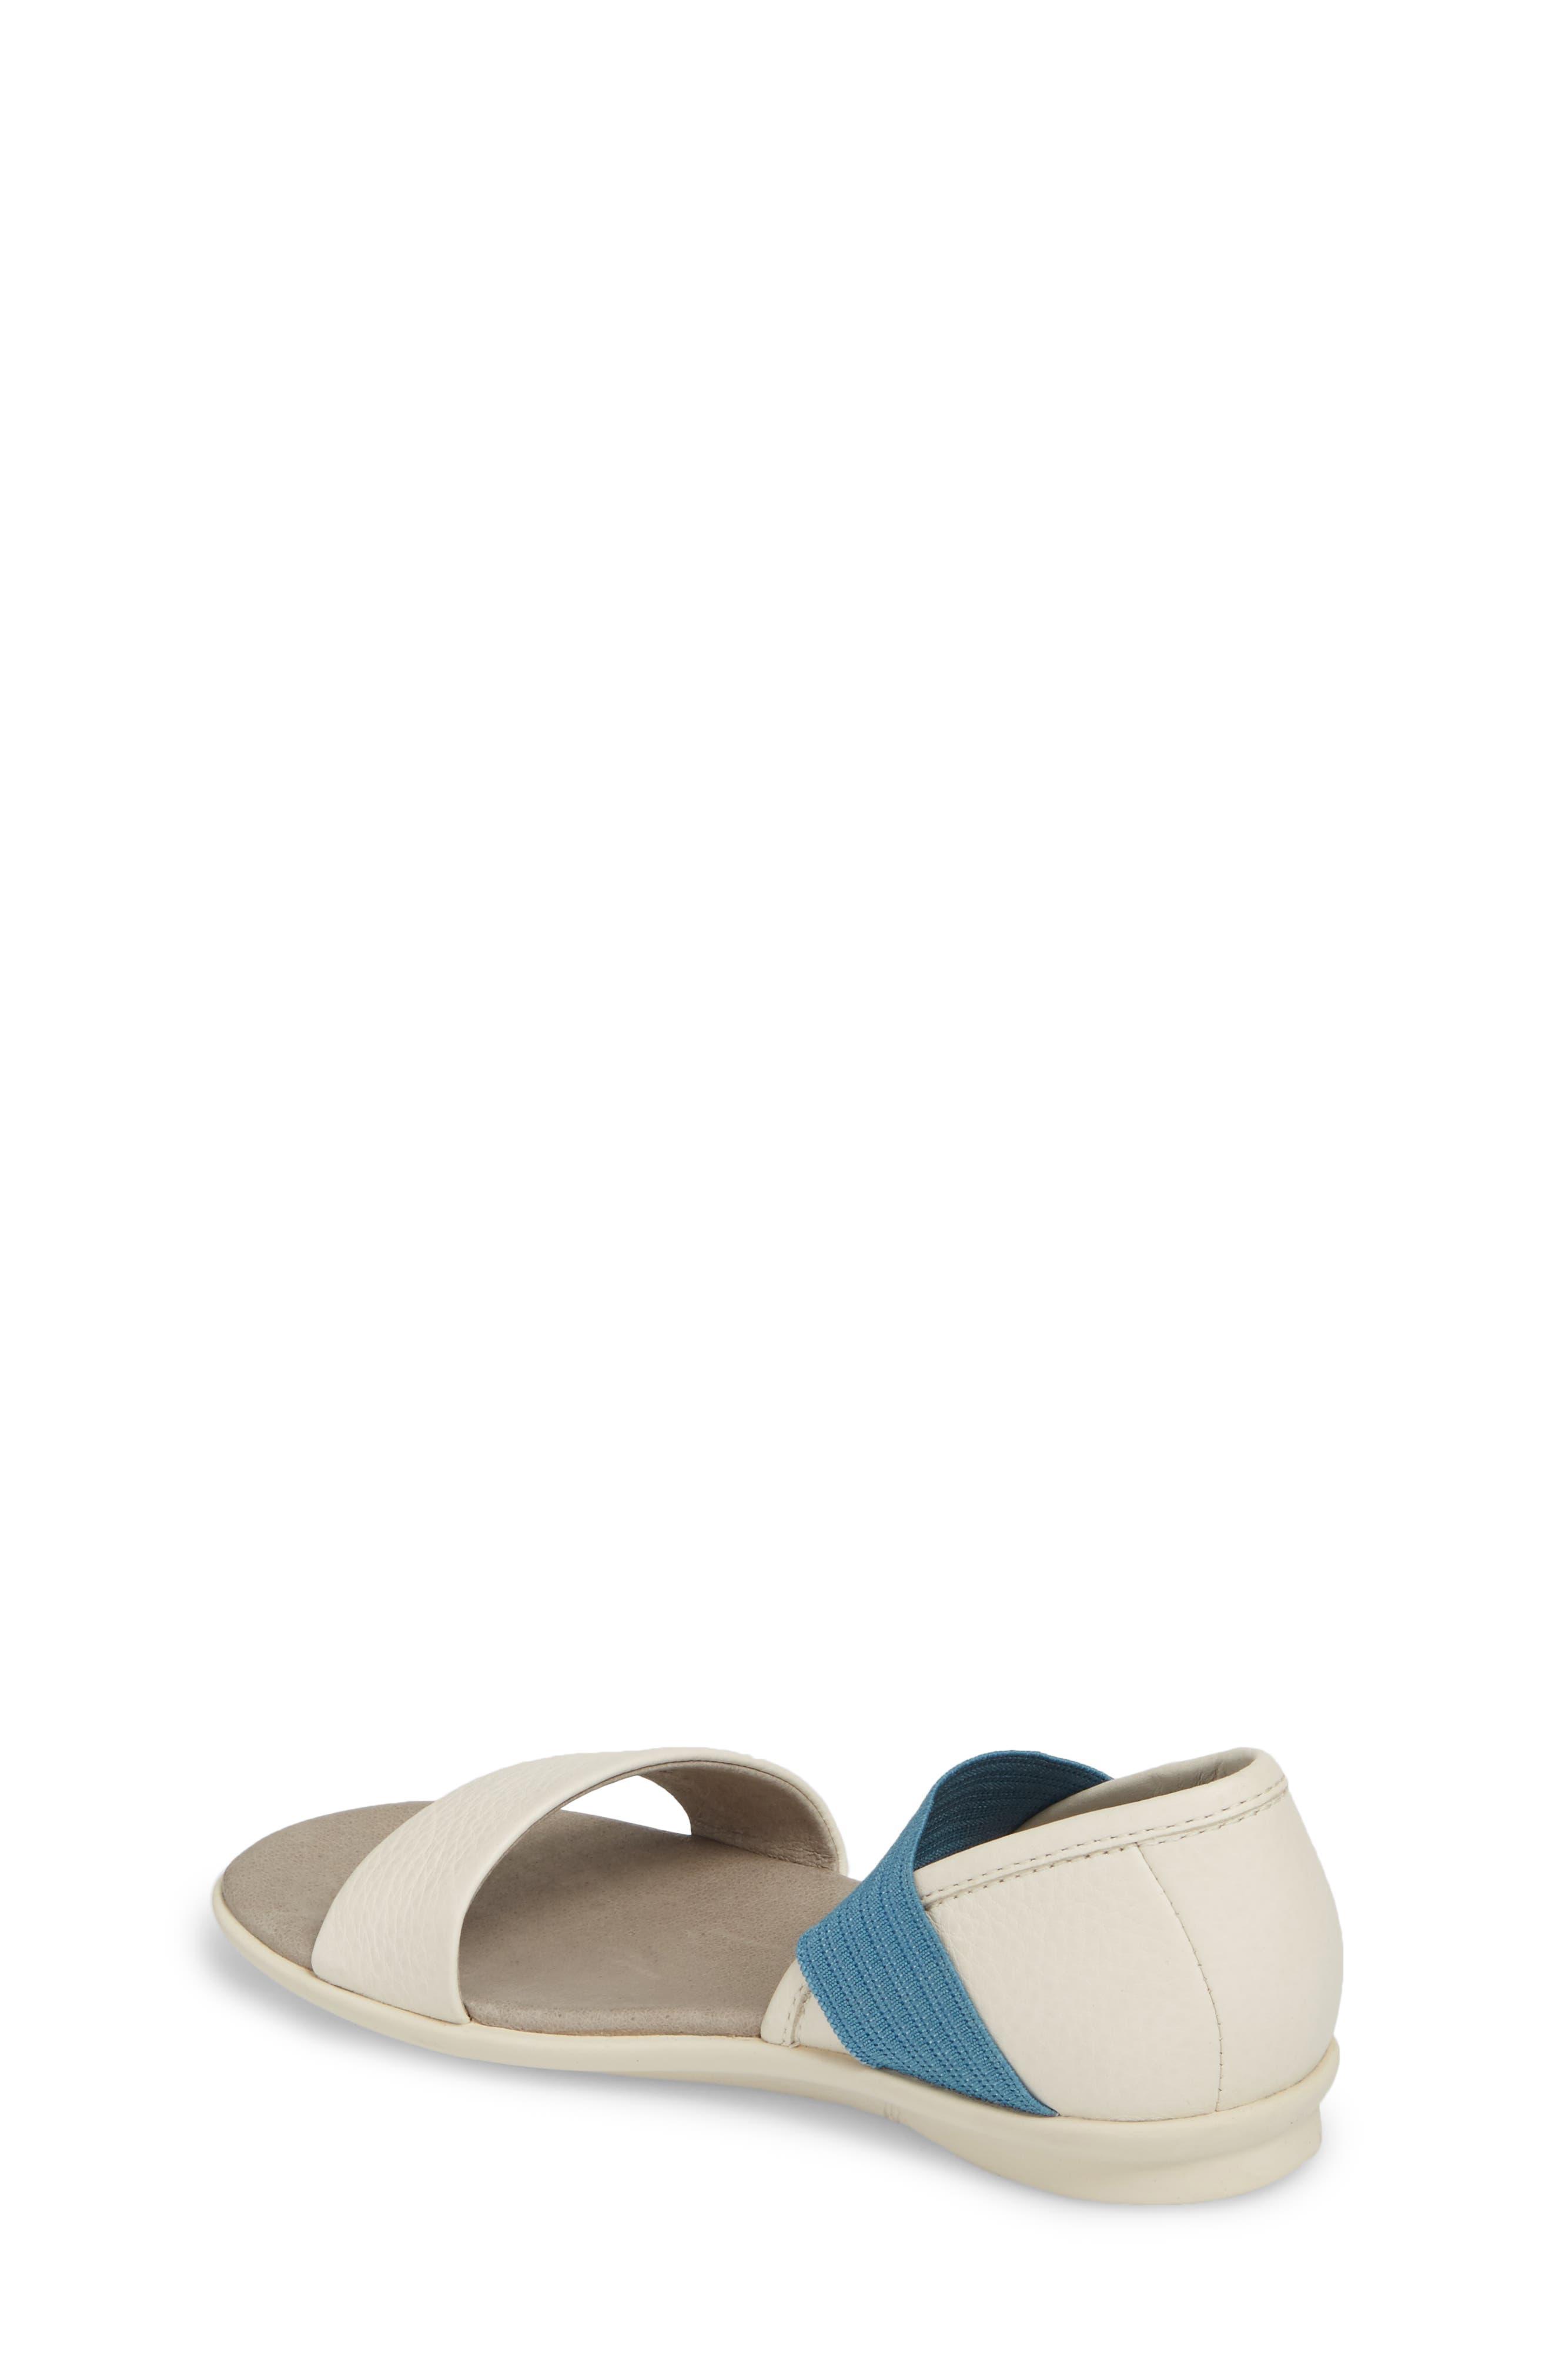 Right Sandal,                             Alternate thumbnail 2, color,                             WHITE